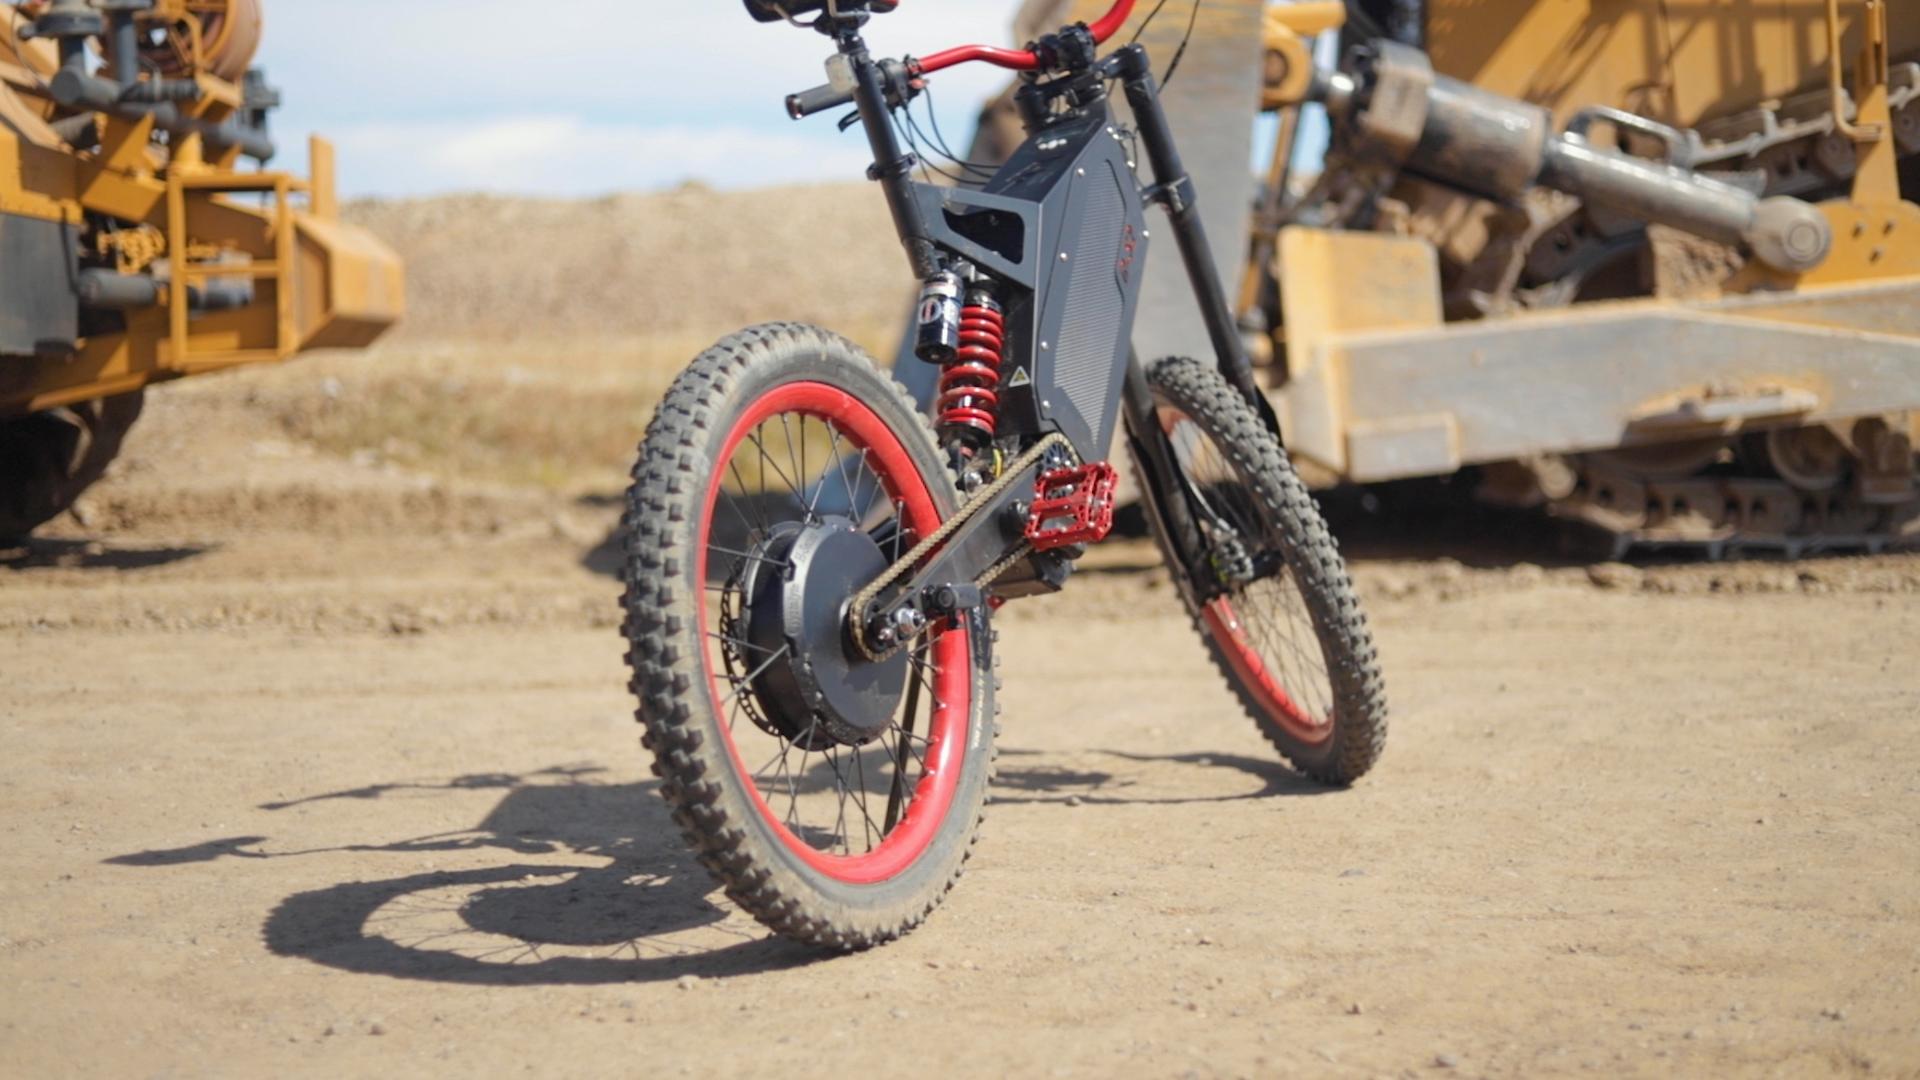 electrified-reviews-stealth-b52-bomber-electric-bike-review-profile-3.jpg